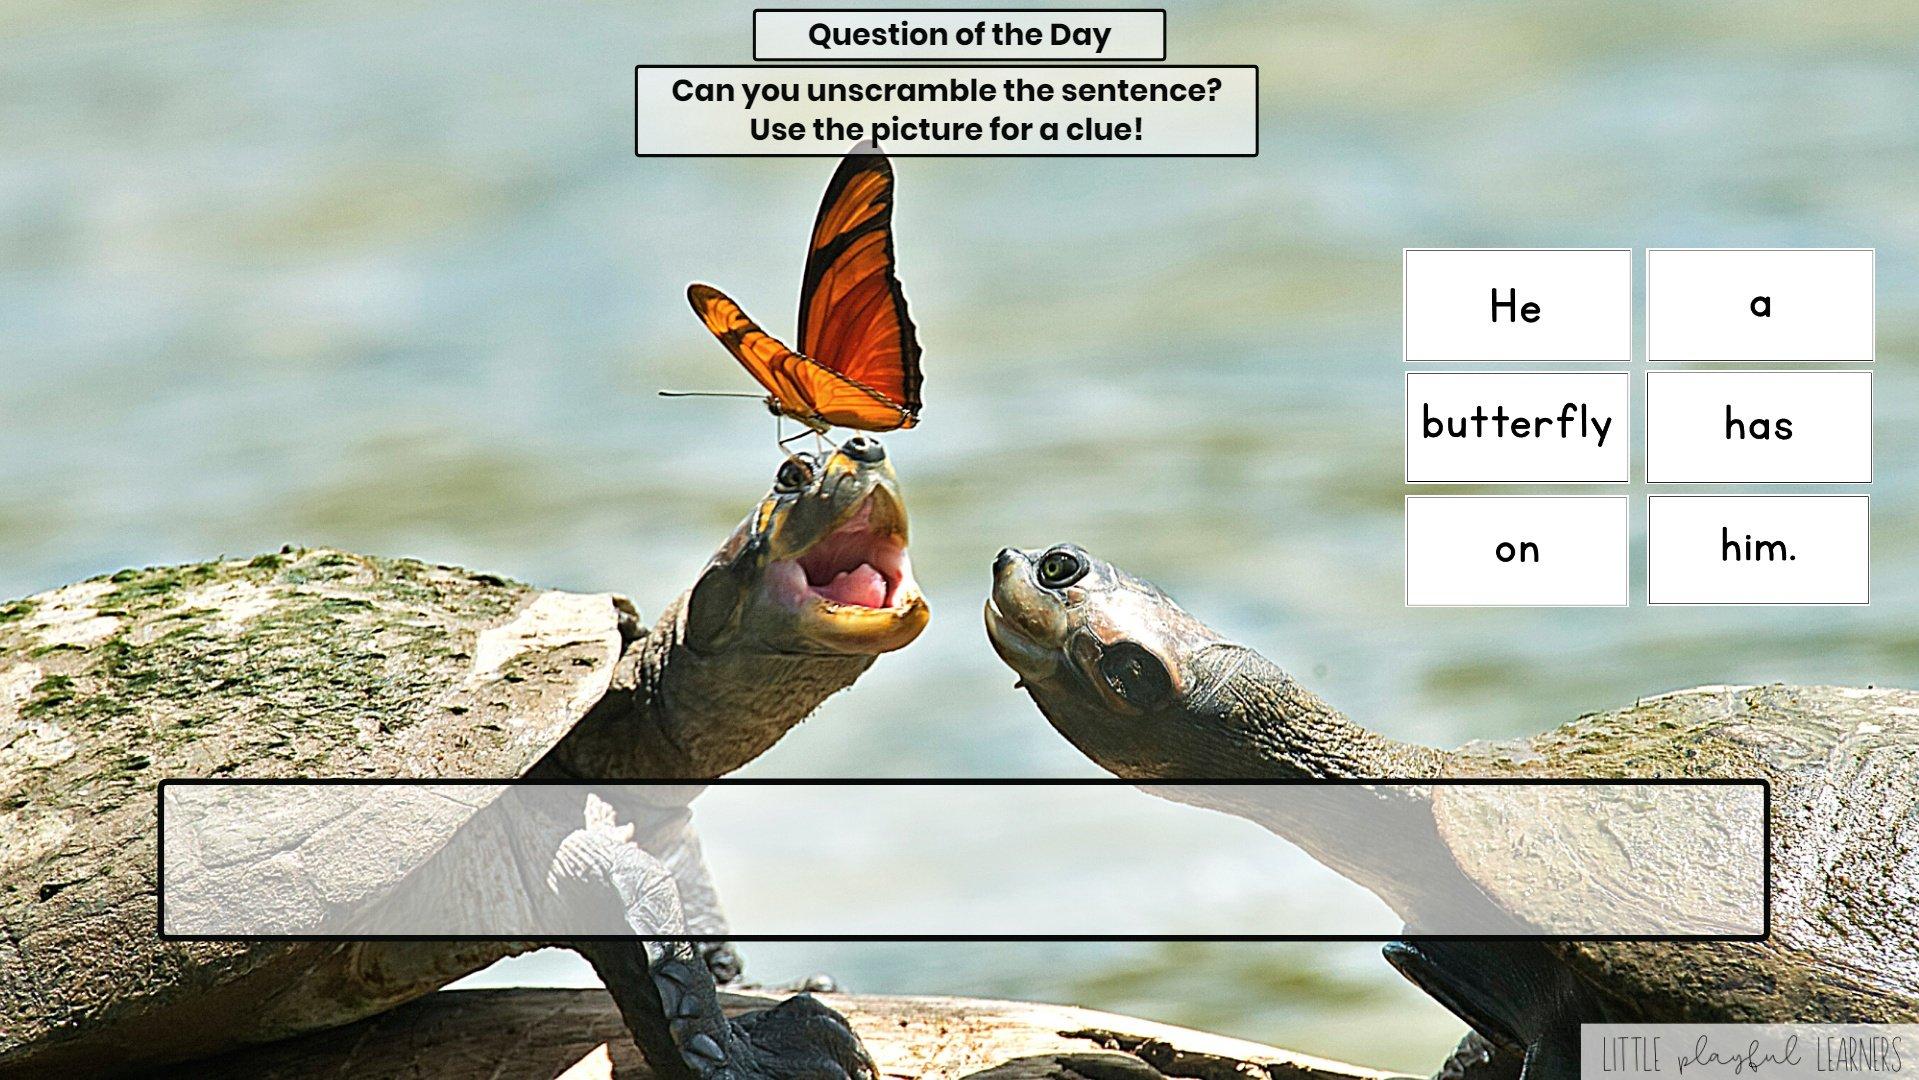 Seesaw: Sentence scramble - insect theme